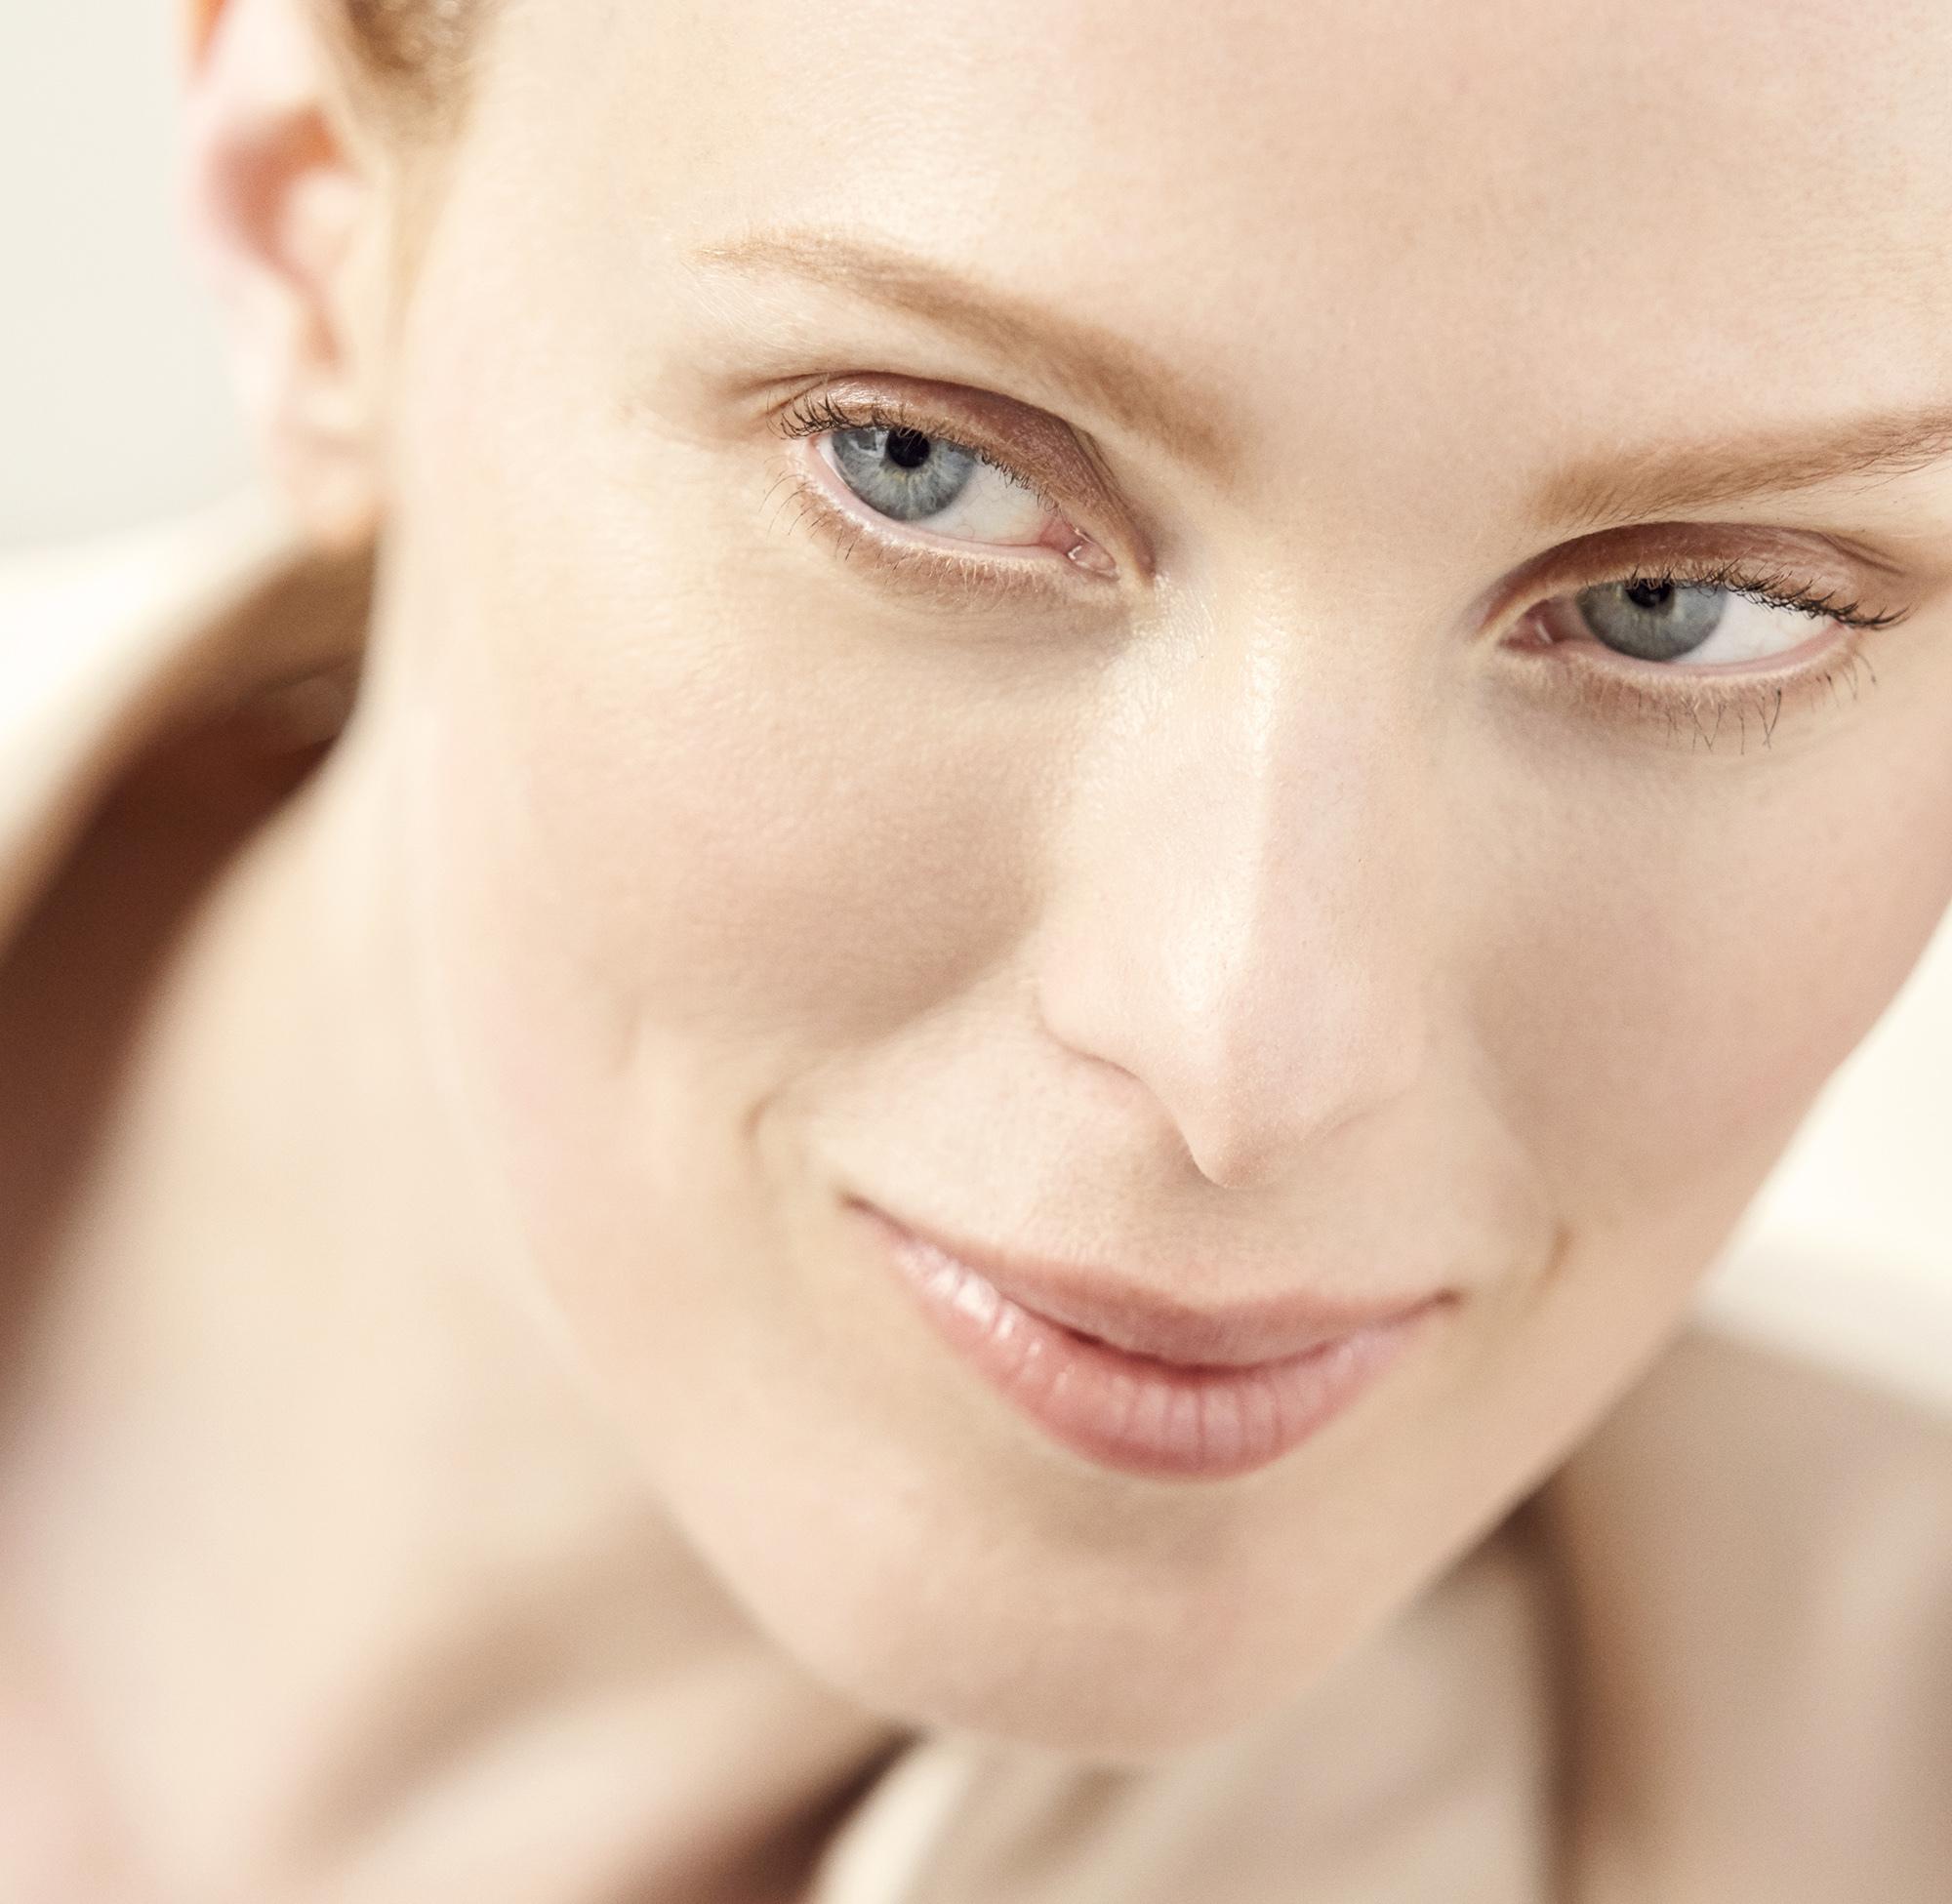 La nueva Vital Perfection Uplifting and firming cream de Shiseido...